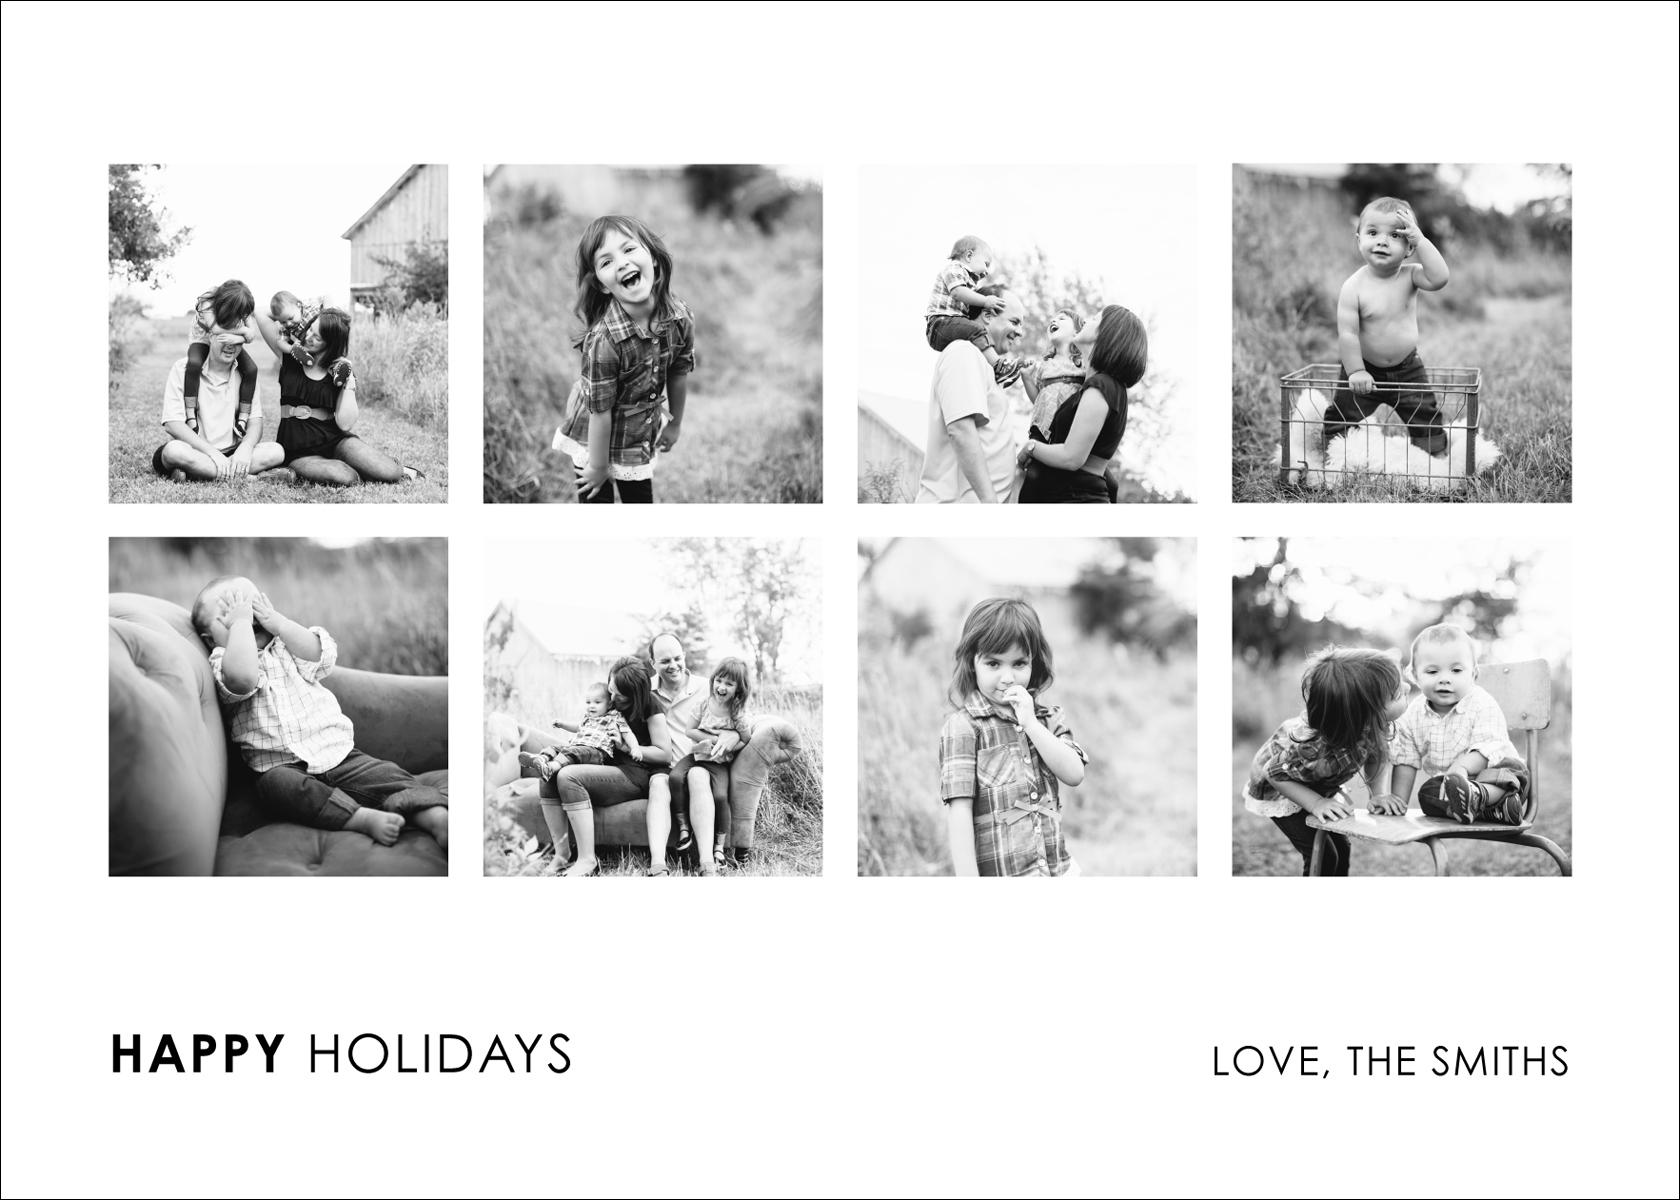 happyholidays.jpg